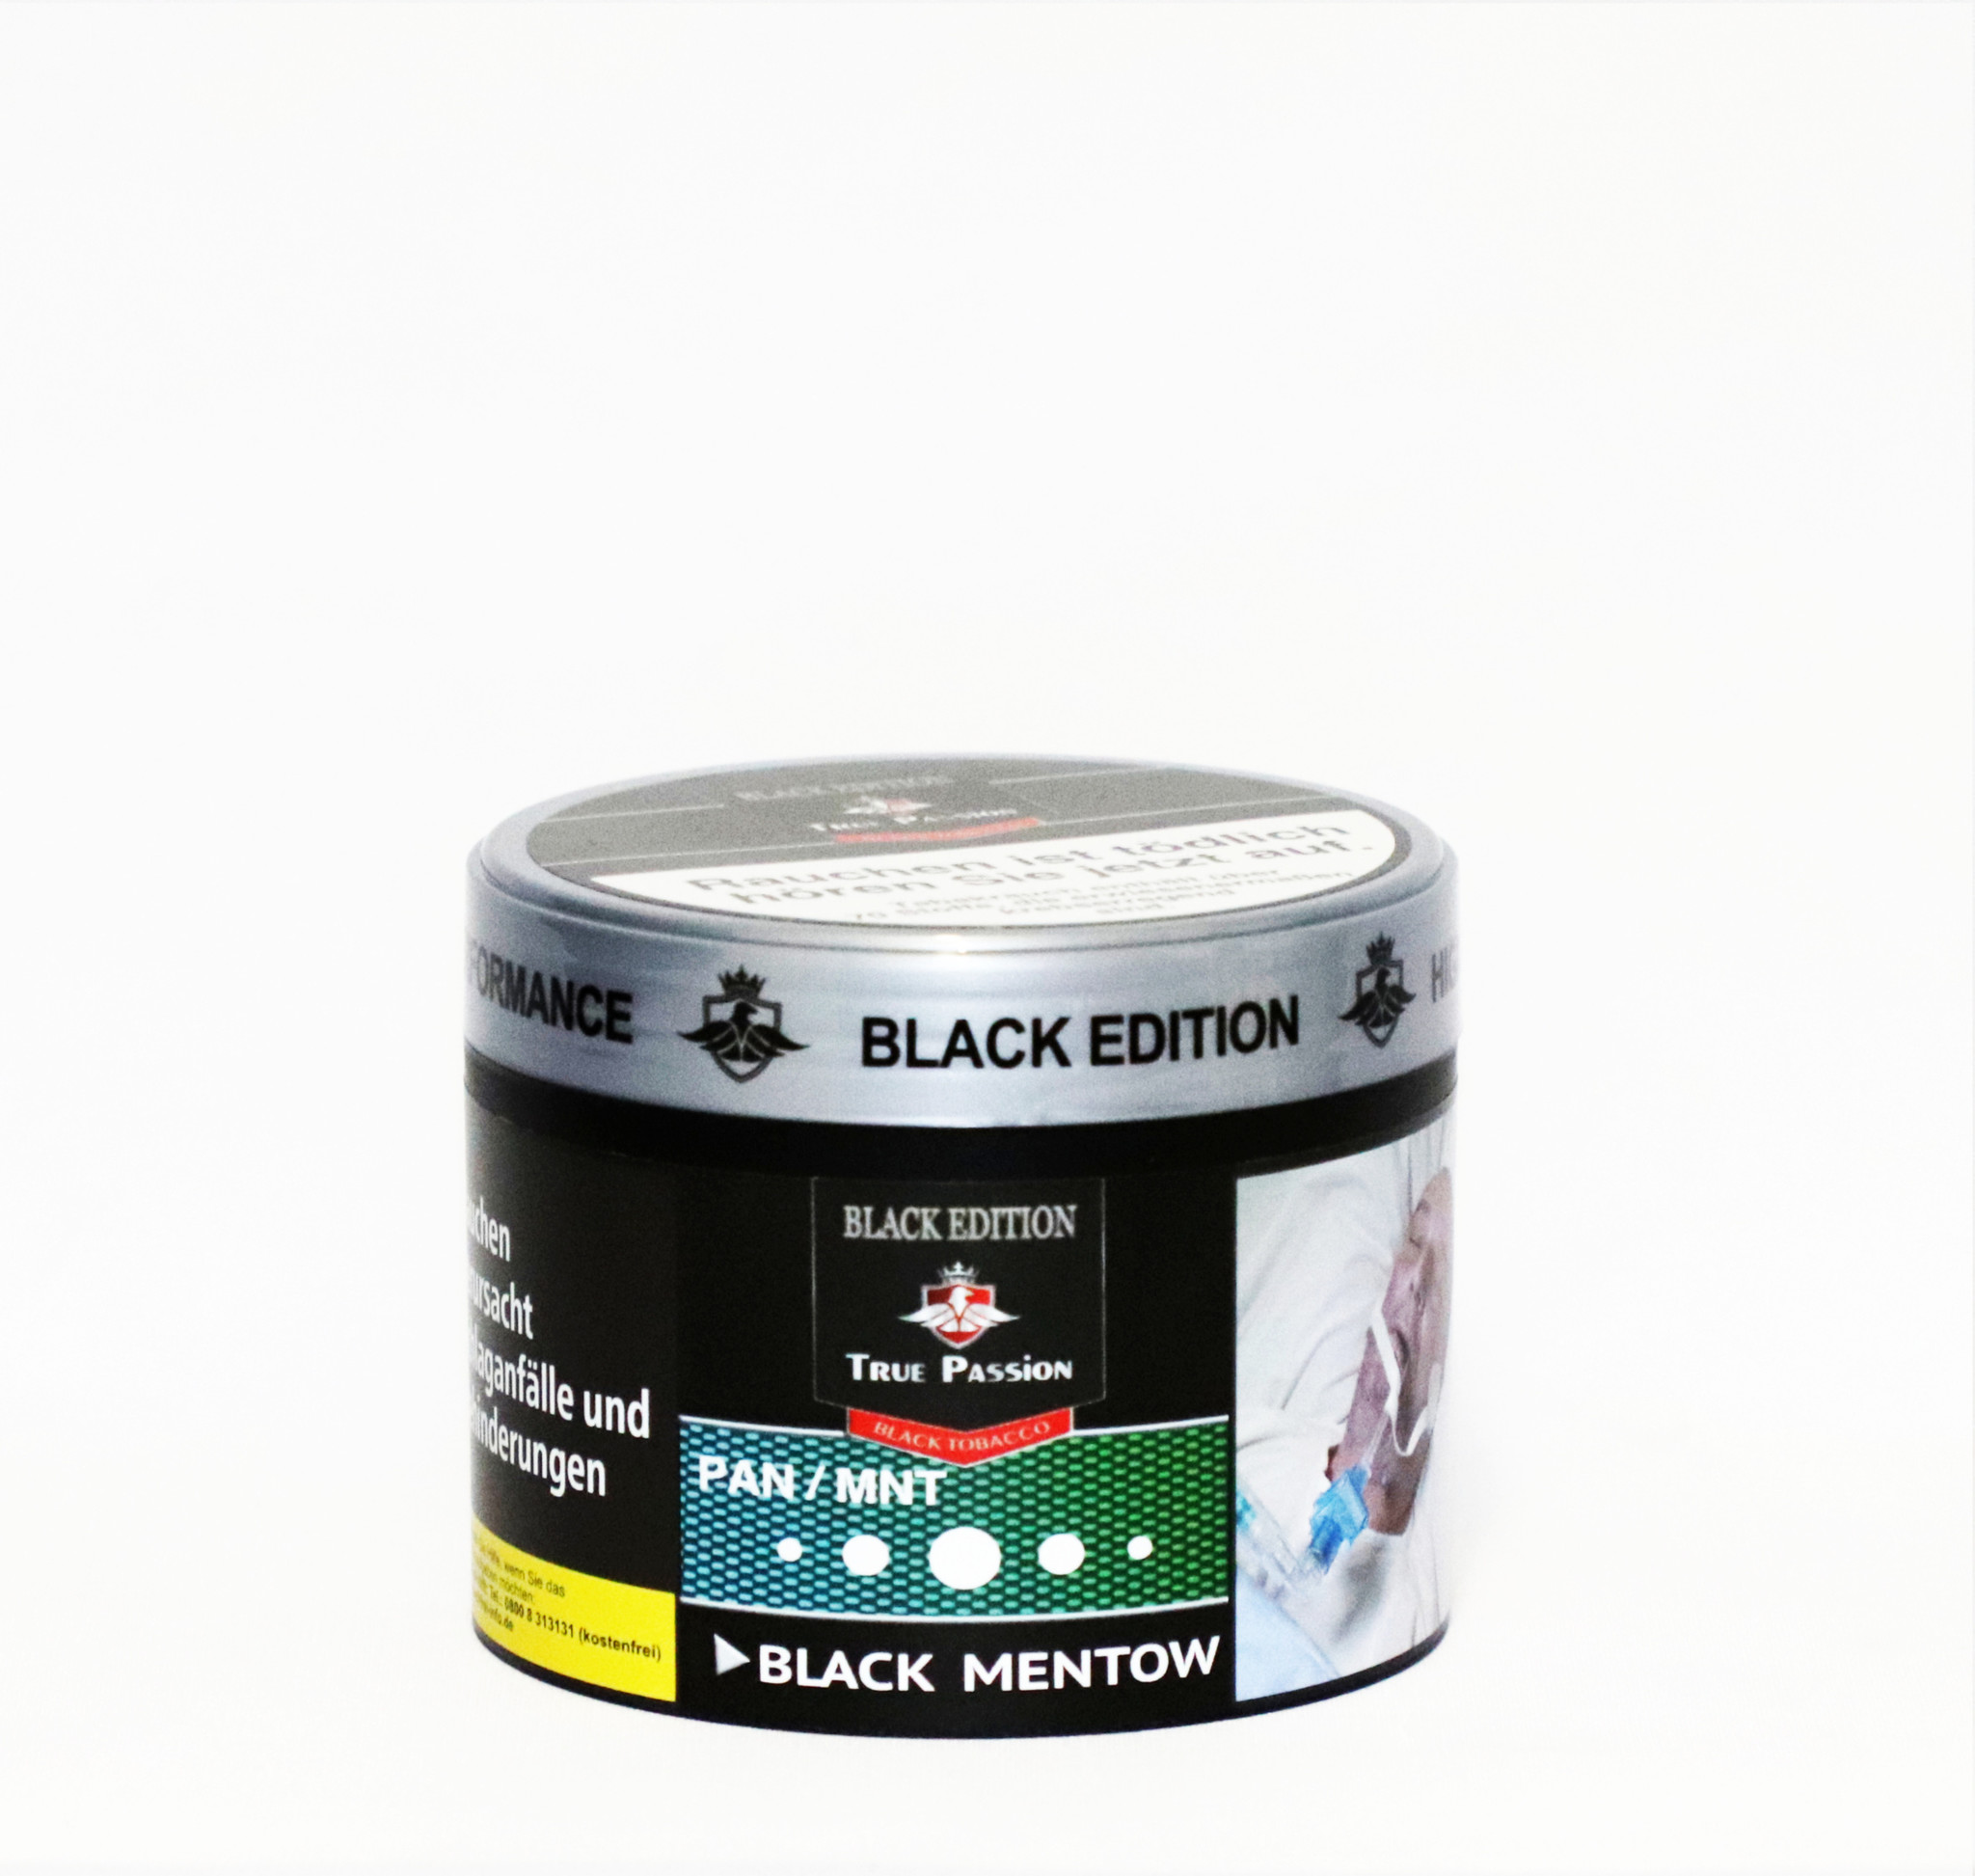 True Passion True Passion -BLACK Edition - Black Mentow- 200g